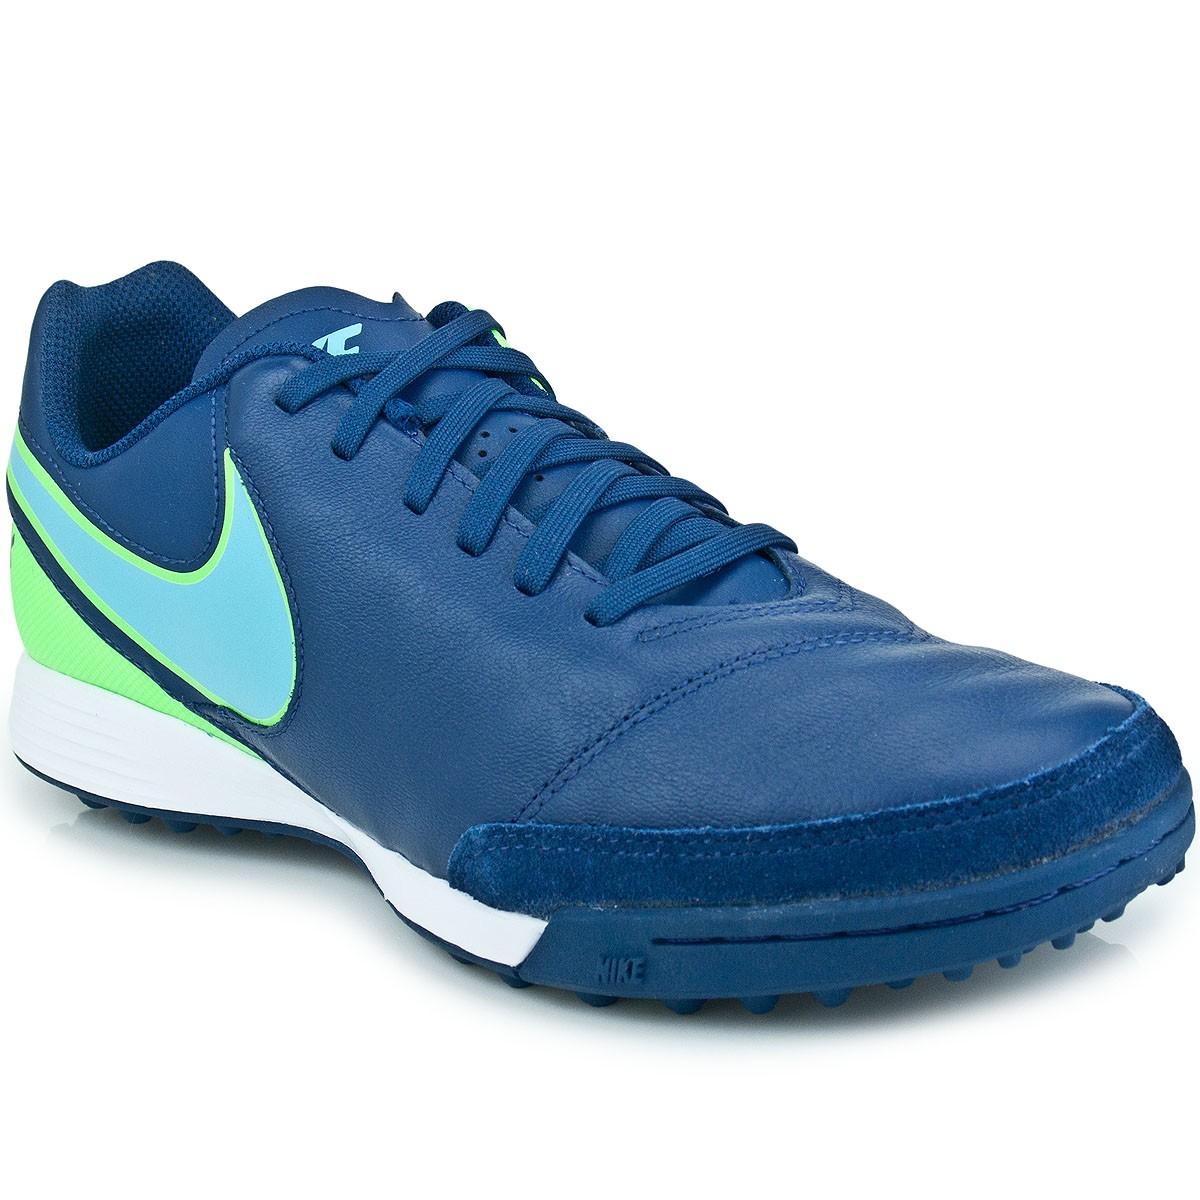 Chuteira Nike Tiempo Genio II Leather TF  30831f9ceecd6